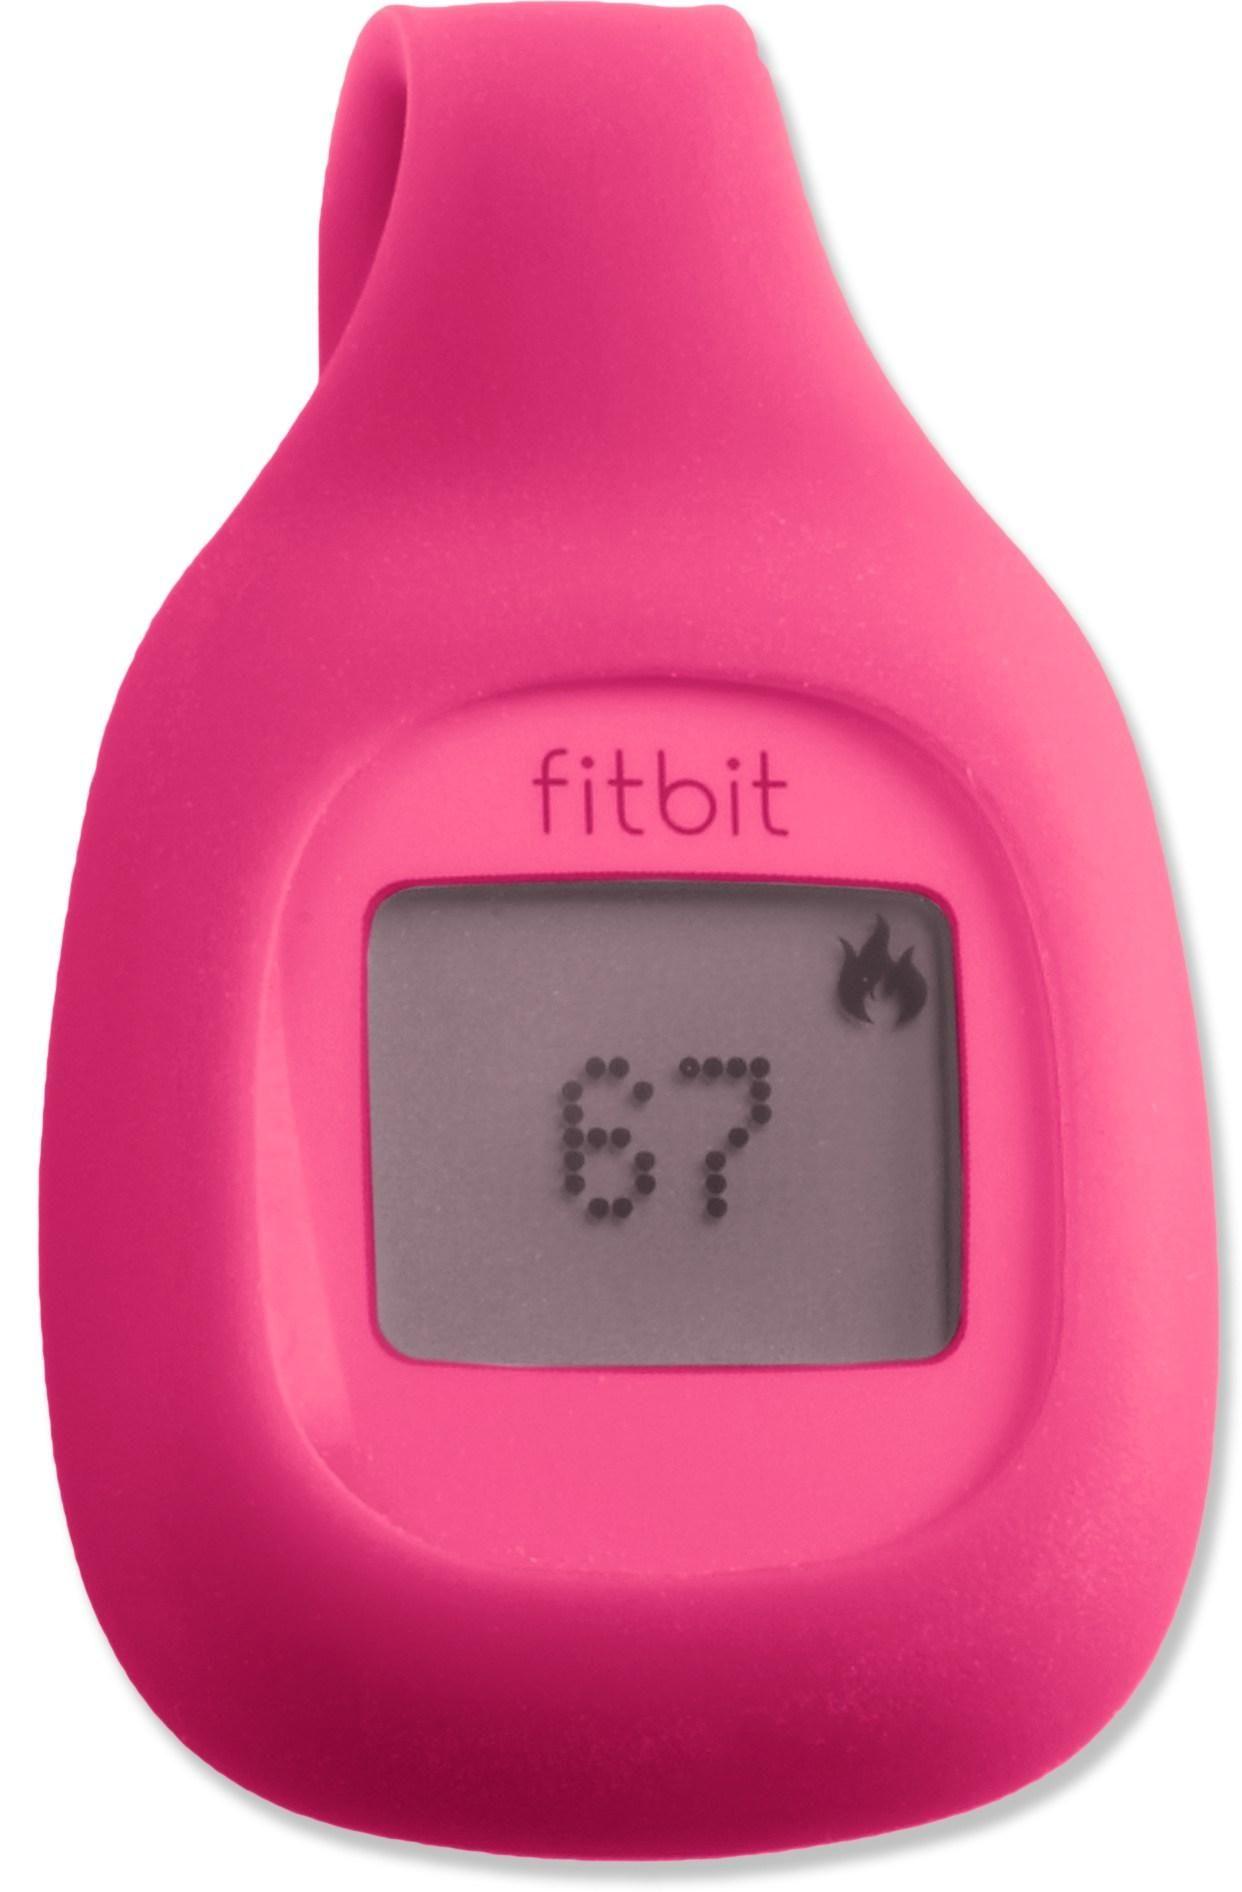 Fitbit Zip Wireless Activity Tracker Fitbit, Fitness